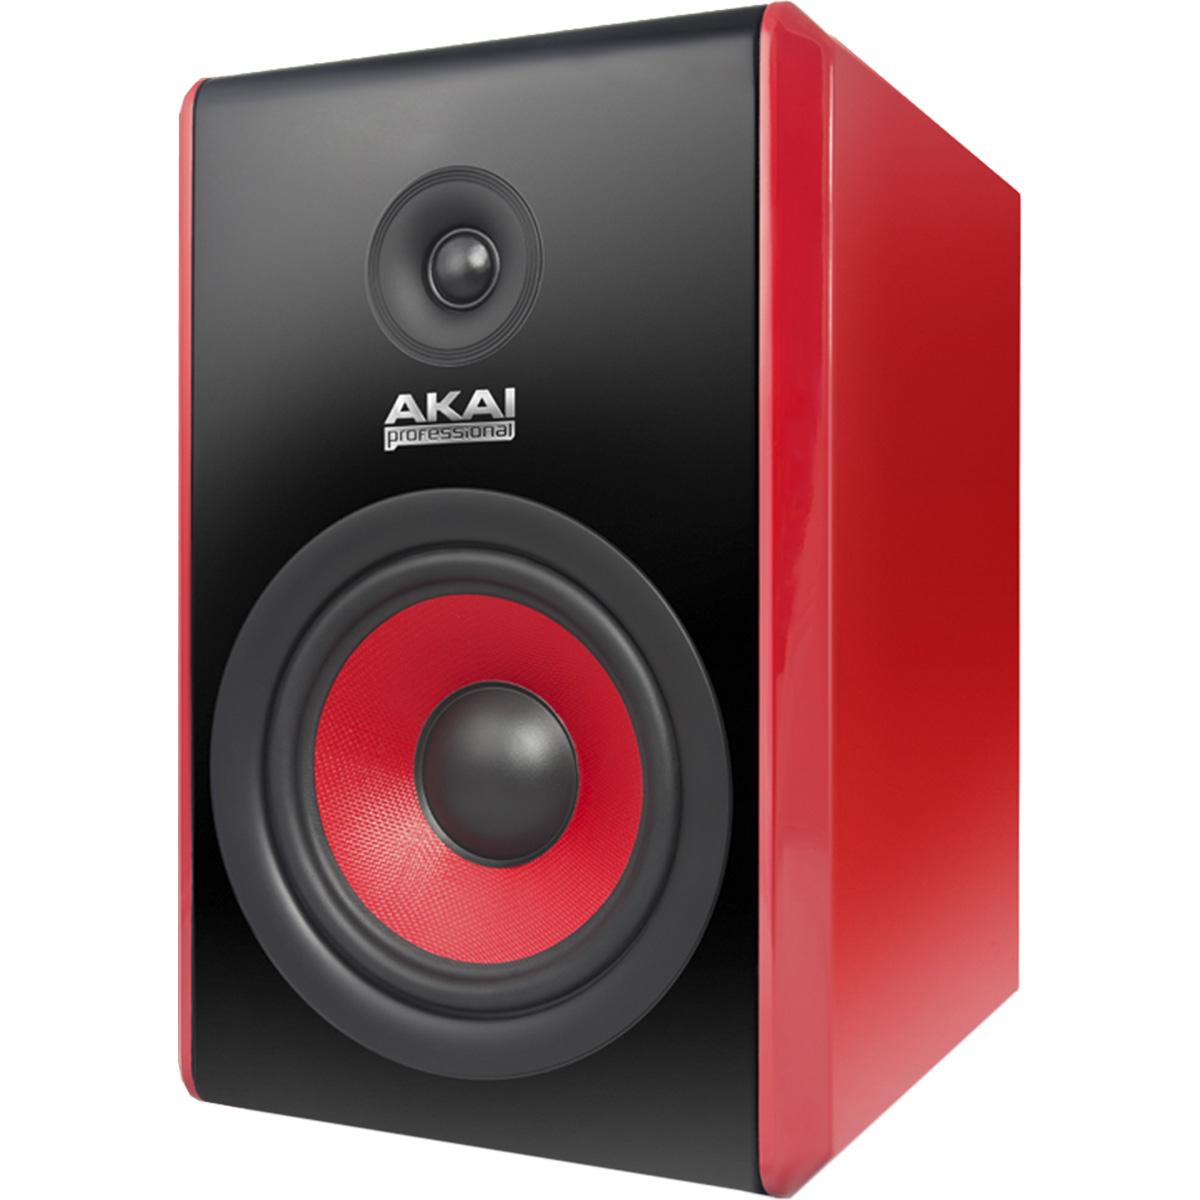 Akai RPM 500 Monitor de referencia, Ativo 90W, Par